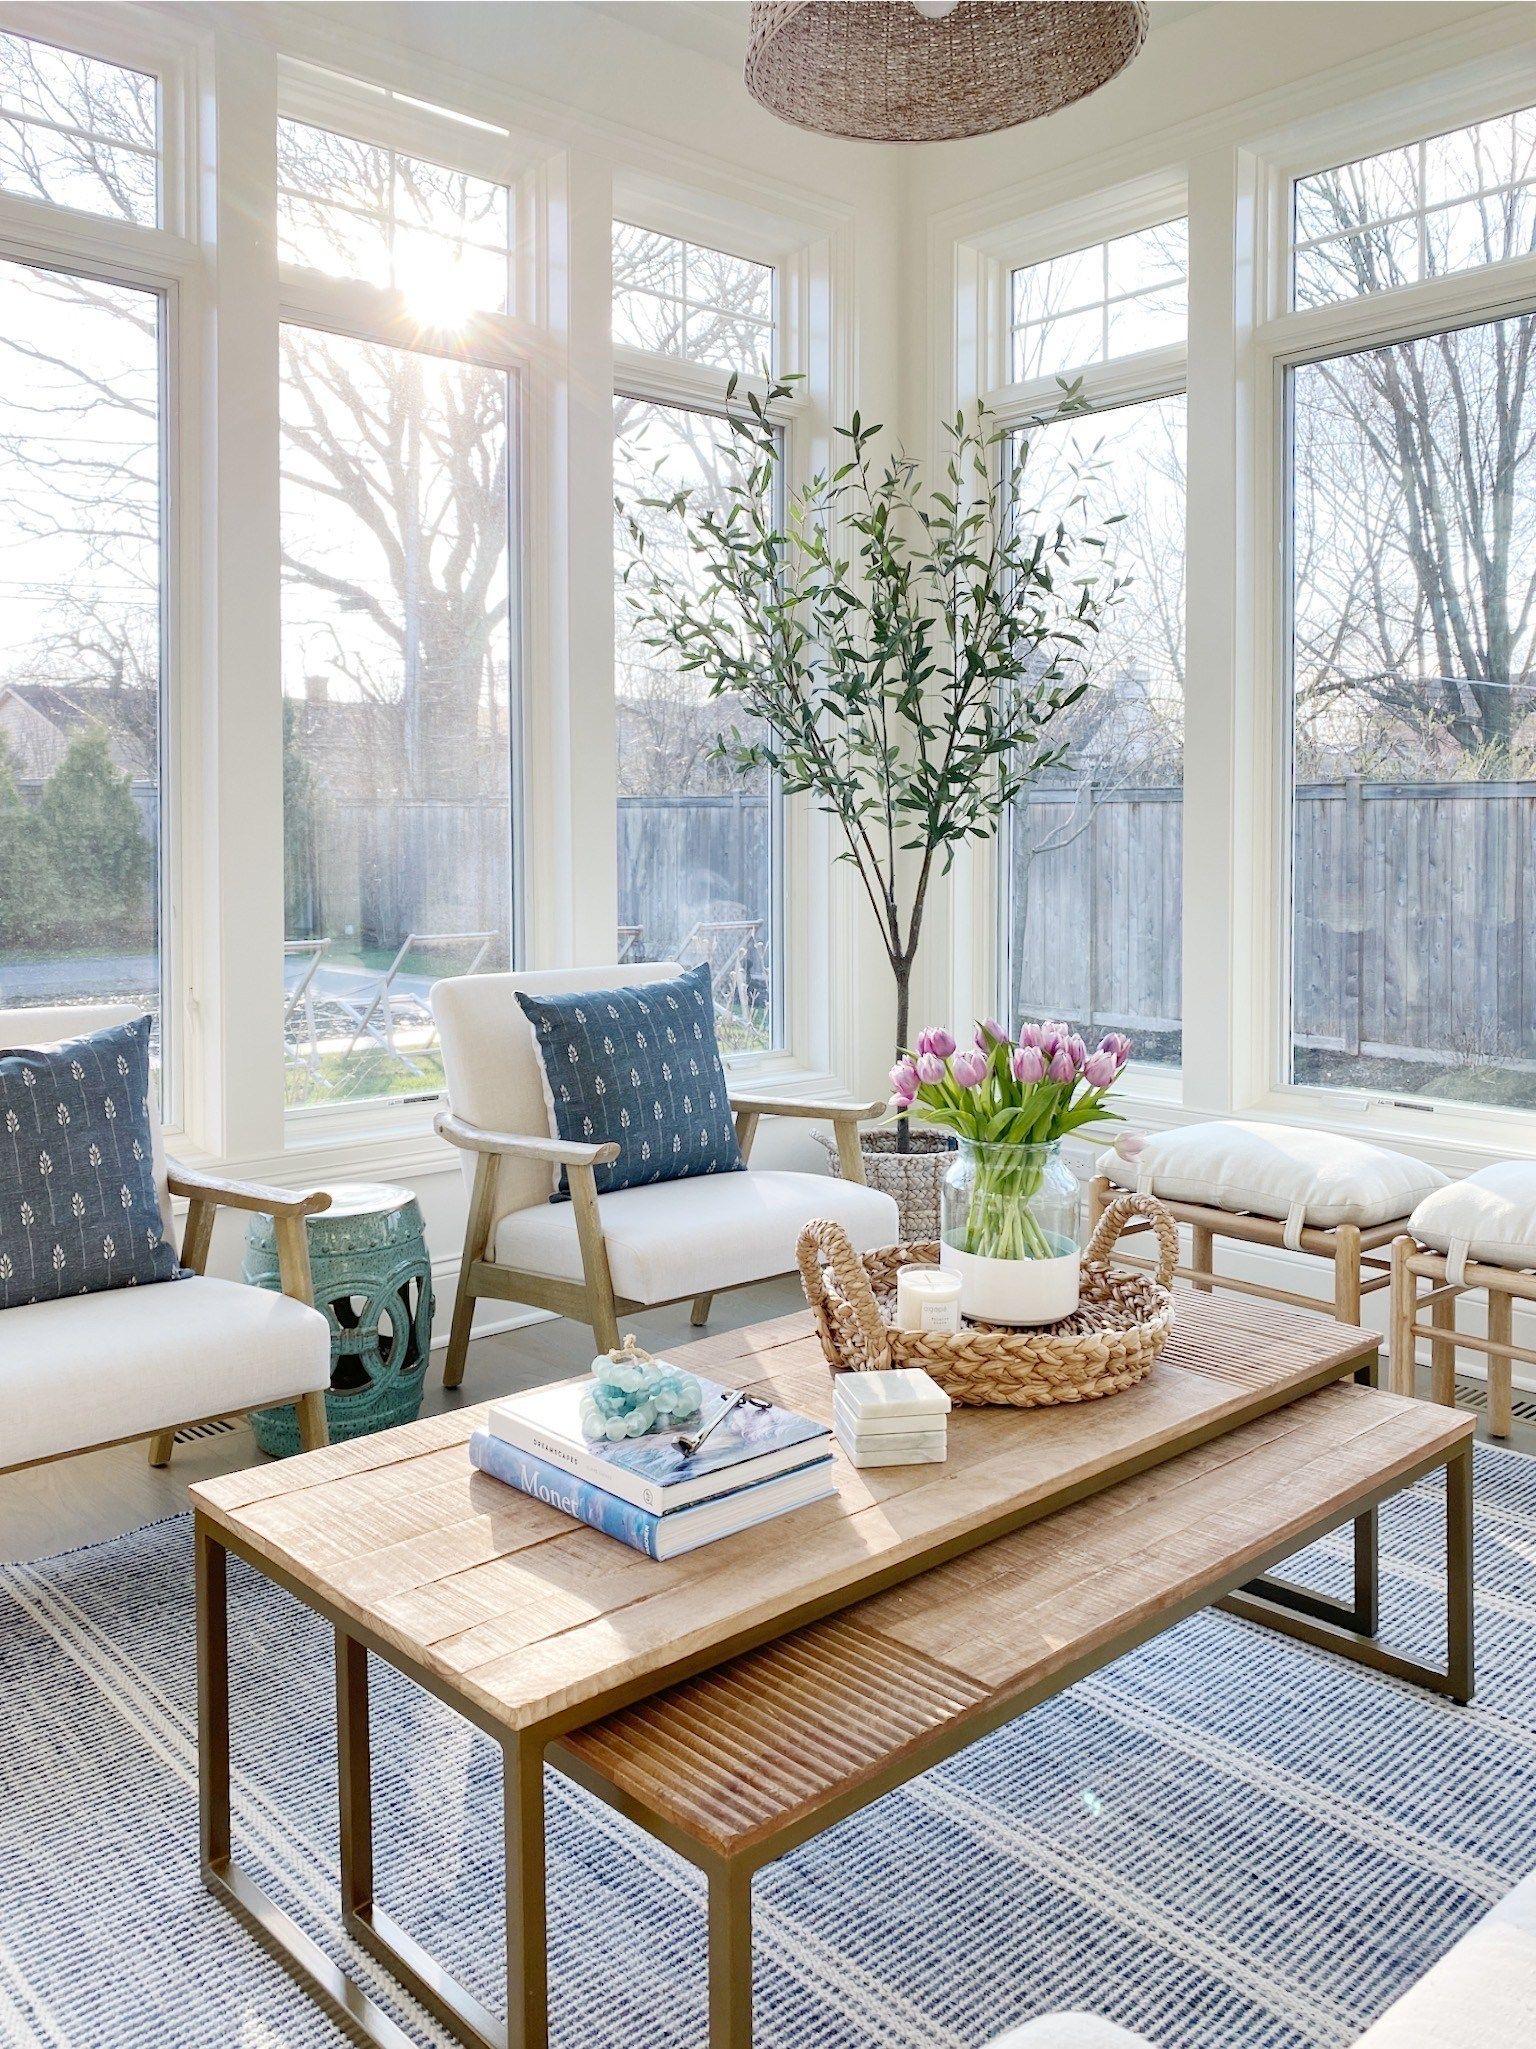 Shopping The Wayfair Save Big Give Back Sale Life On Cedar Lane In 2020 Home Decor Home Home Decor Inspiration